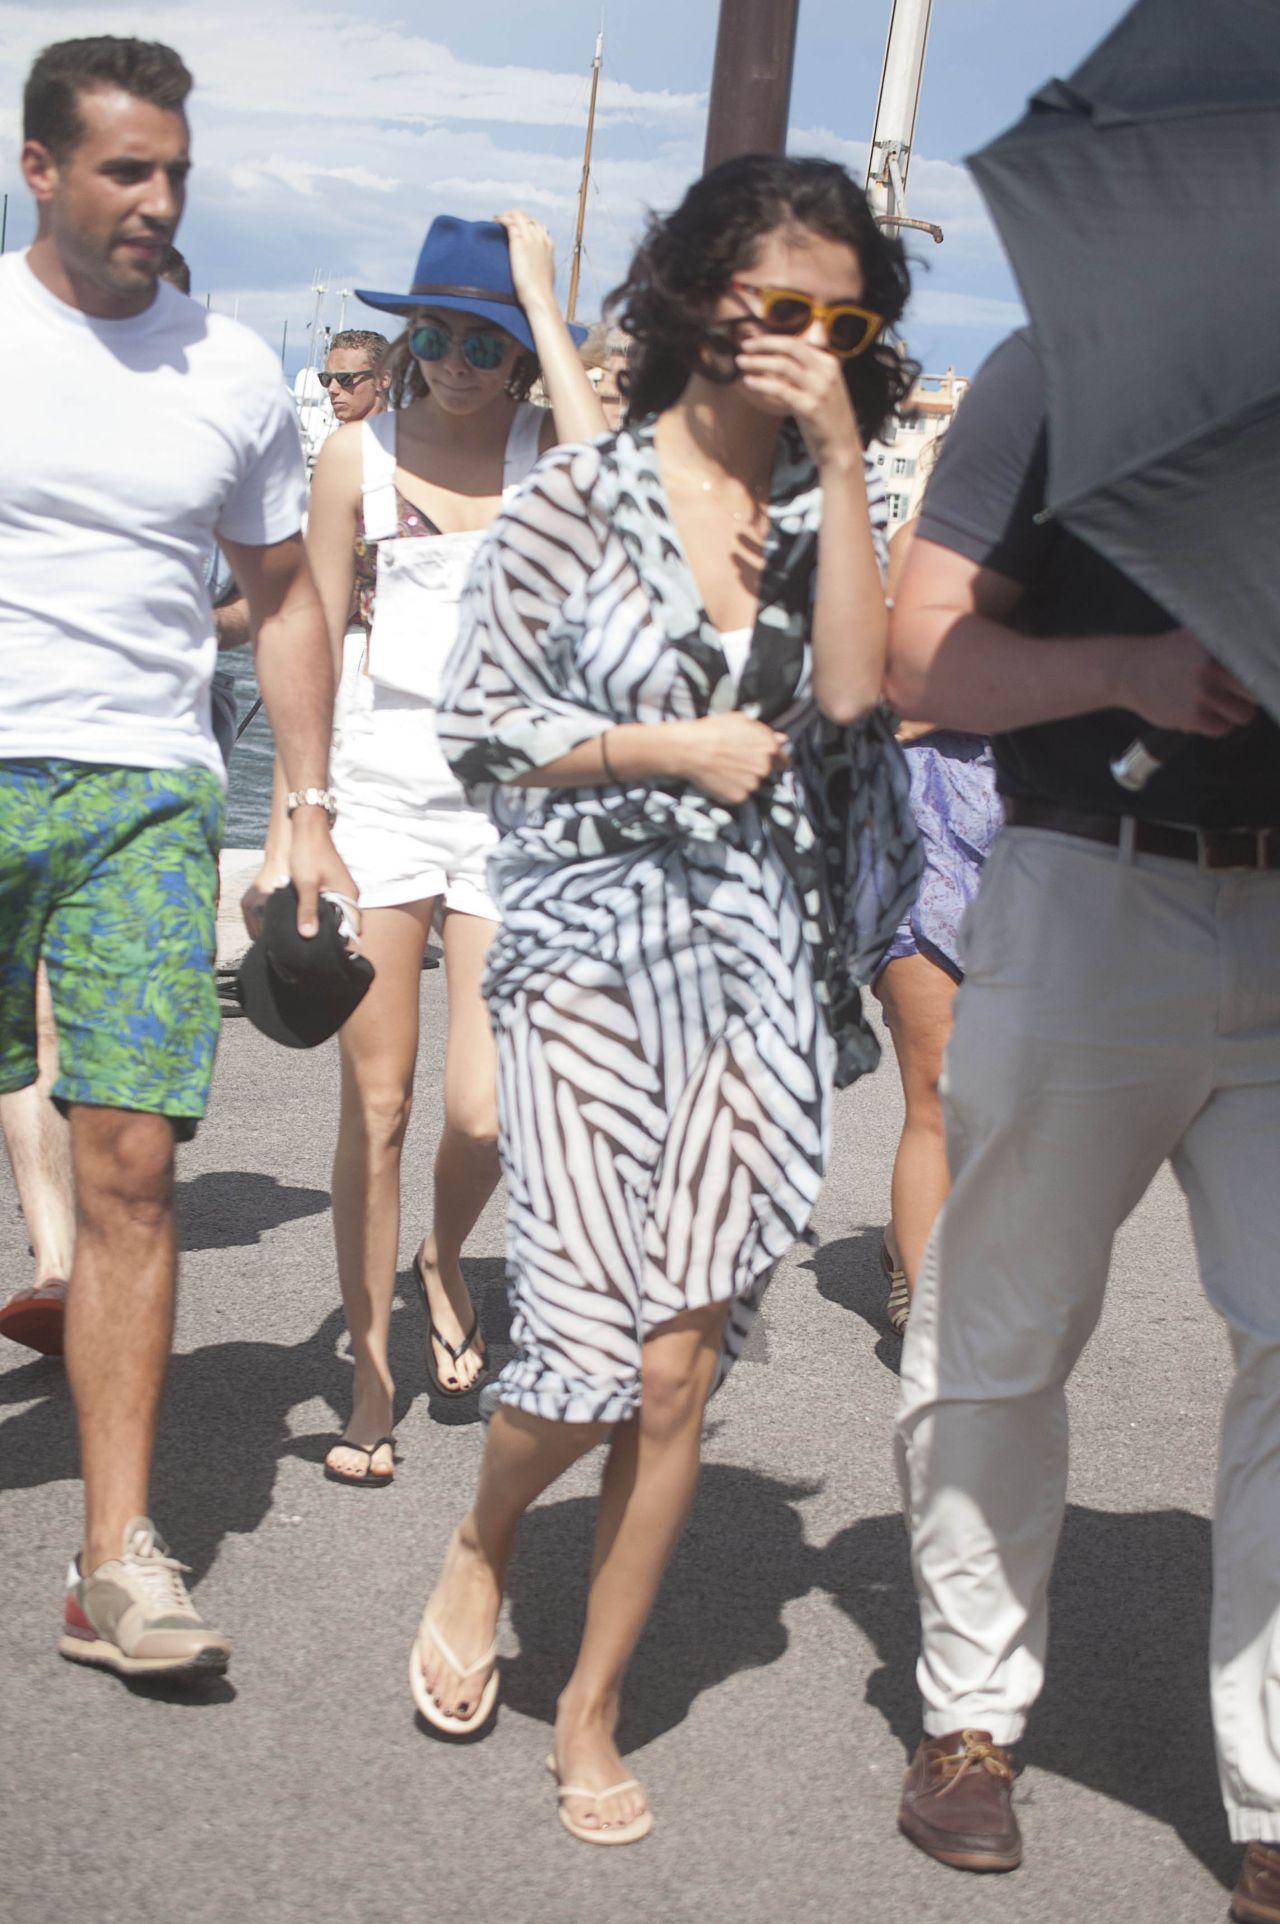 Selena Gomez In A Swimsuit On A Boat In St Tropez France